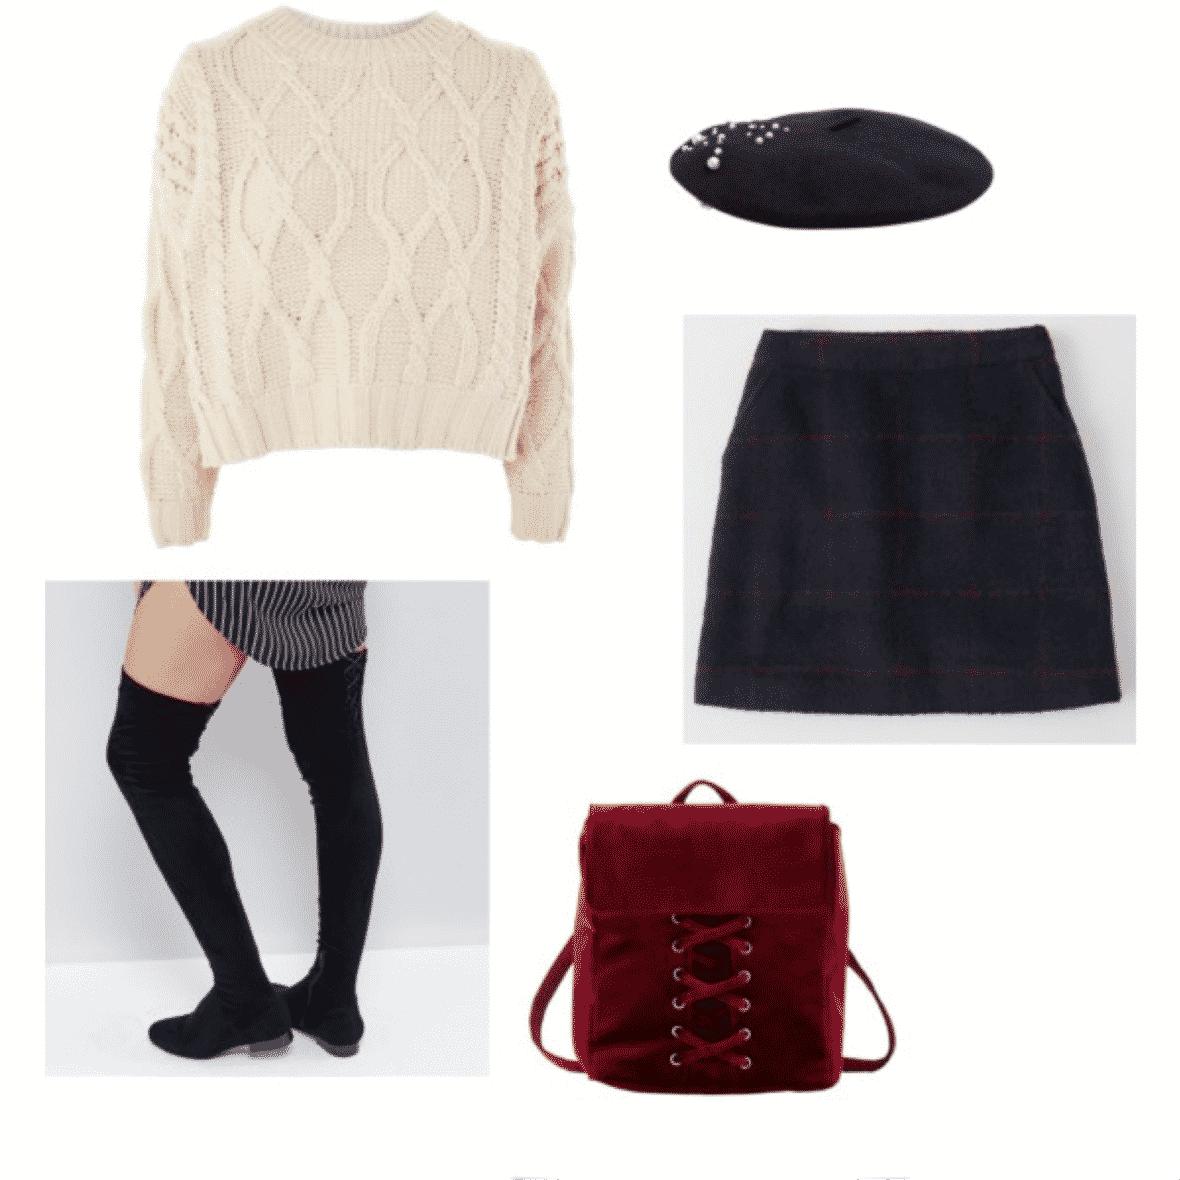 julia engel outfit 3: cream sweater, knee high socks, skirt, beret